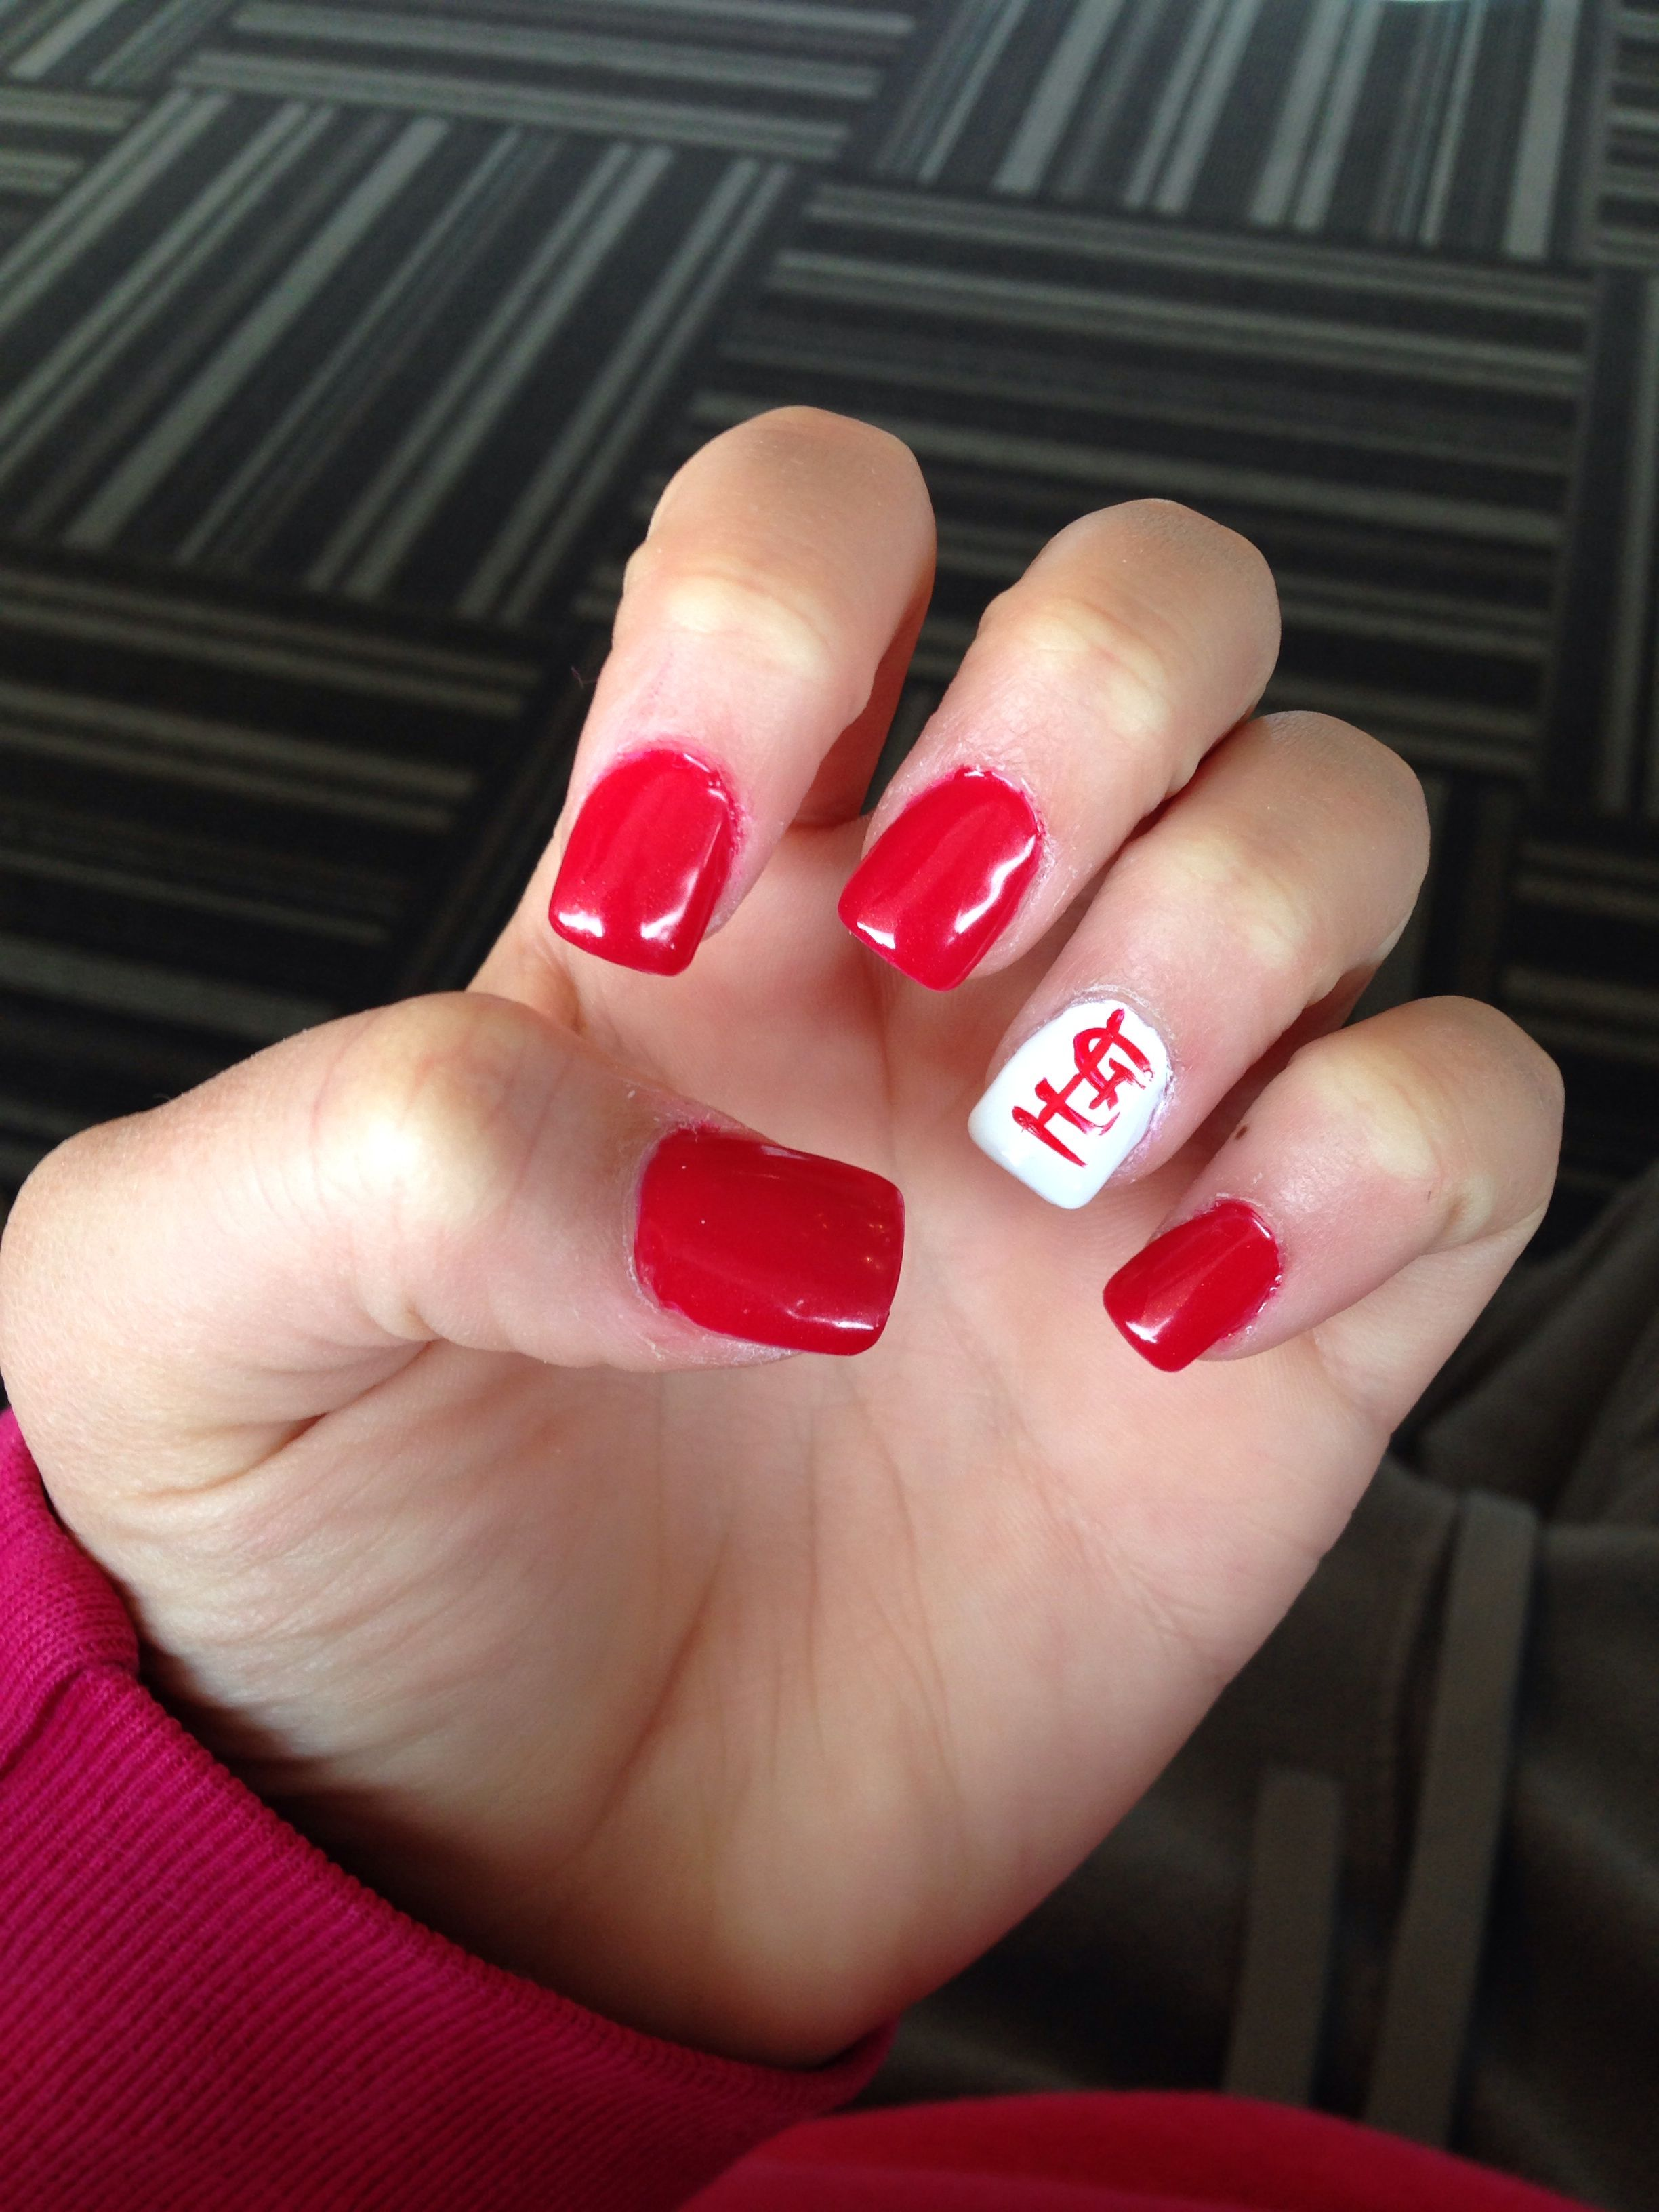 St Louis Cardinal Nails Nails Pinterest St Louis Cardinals